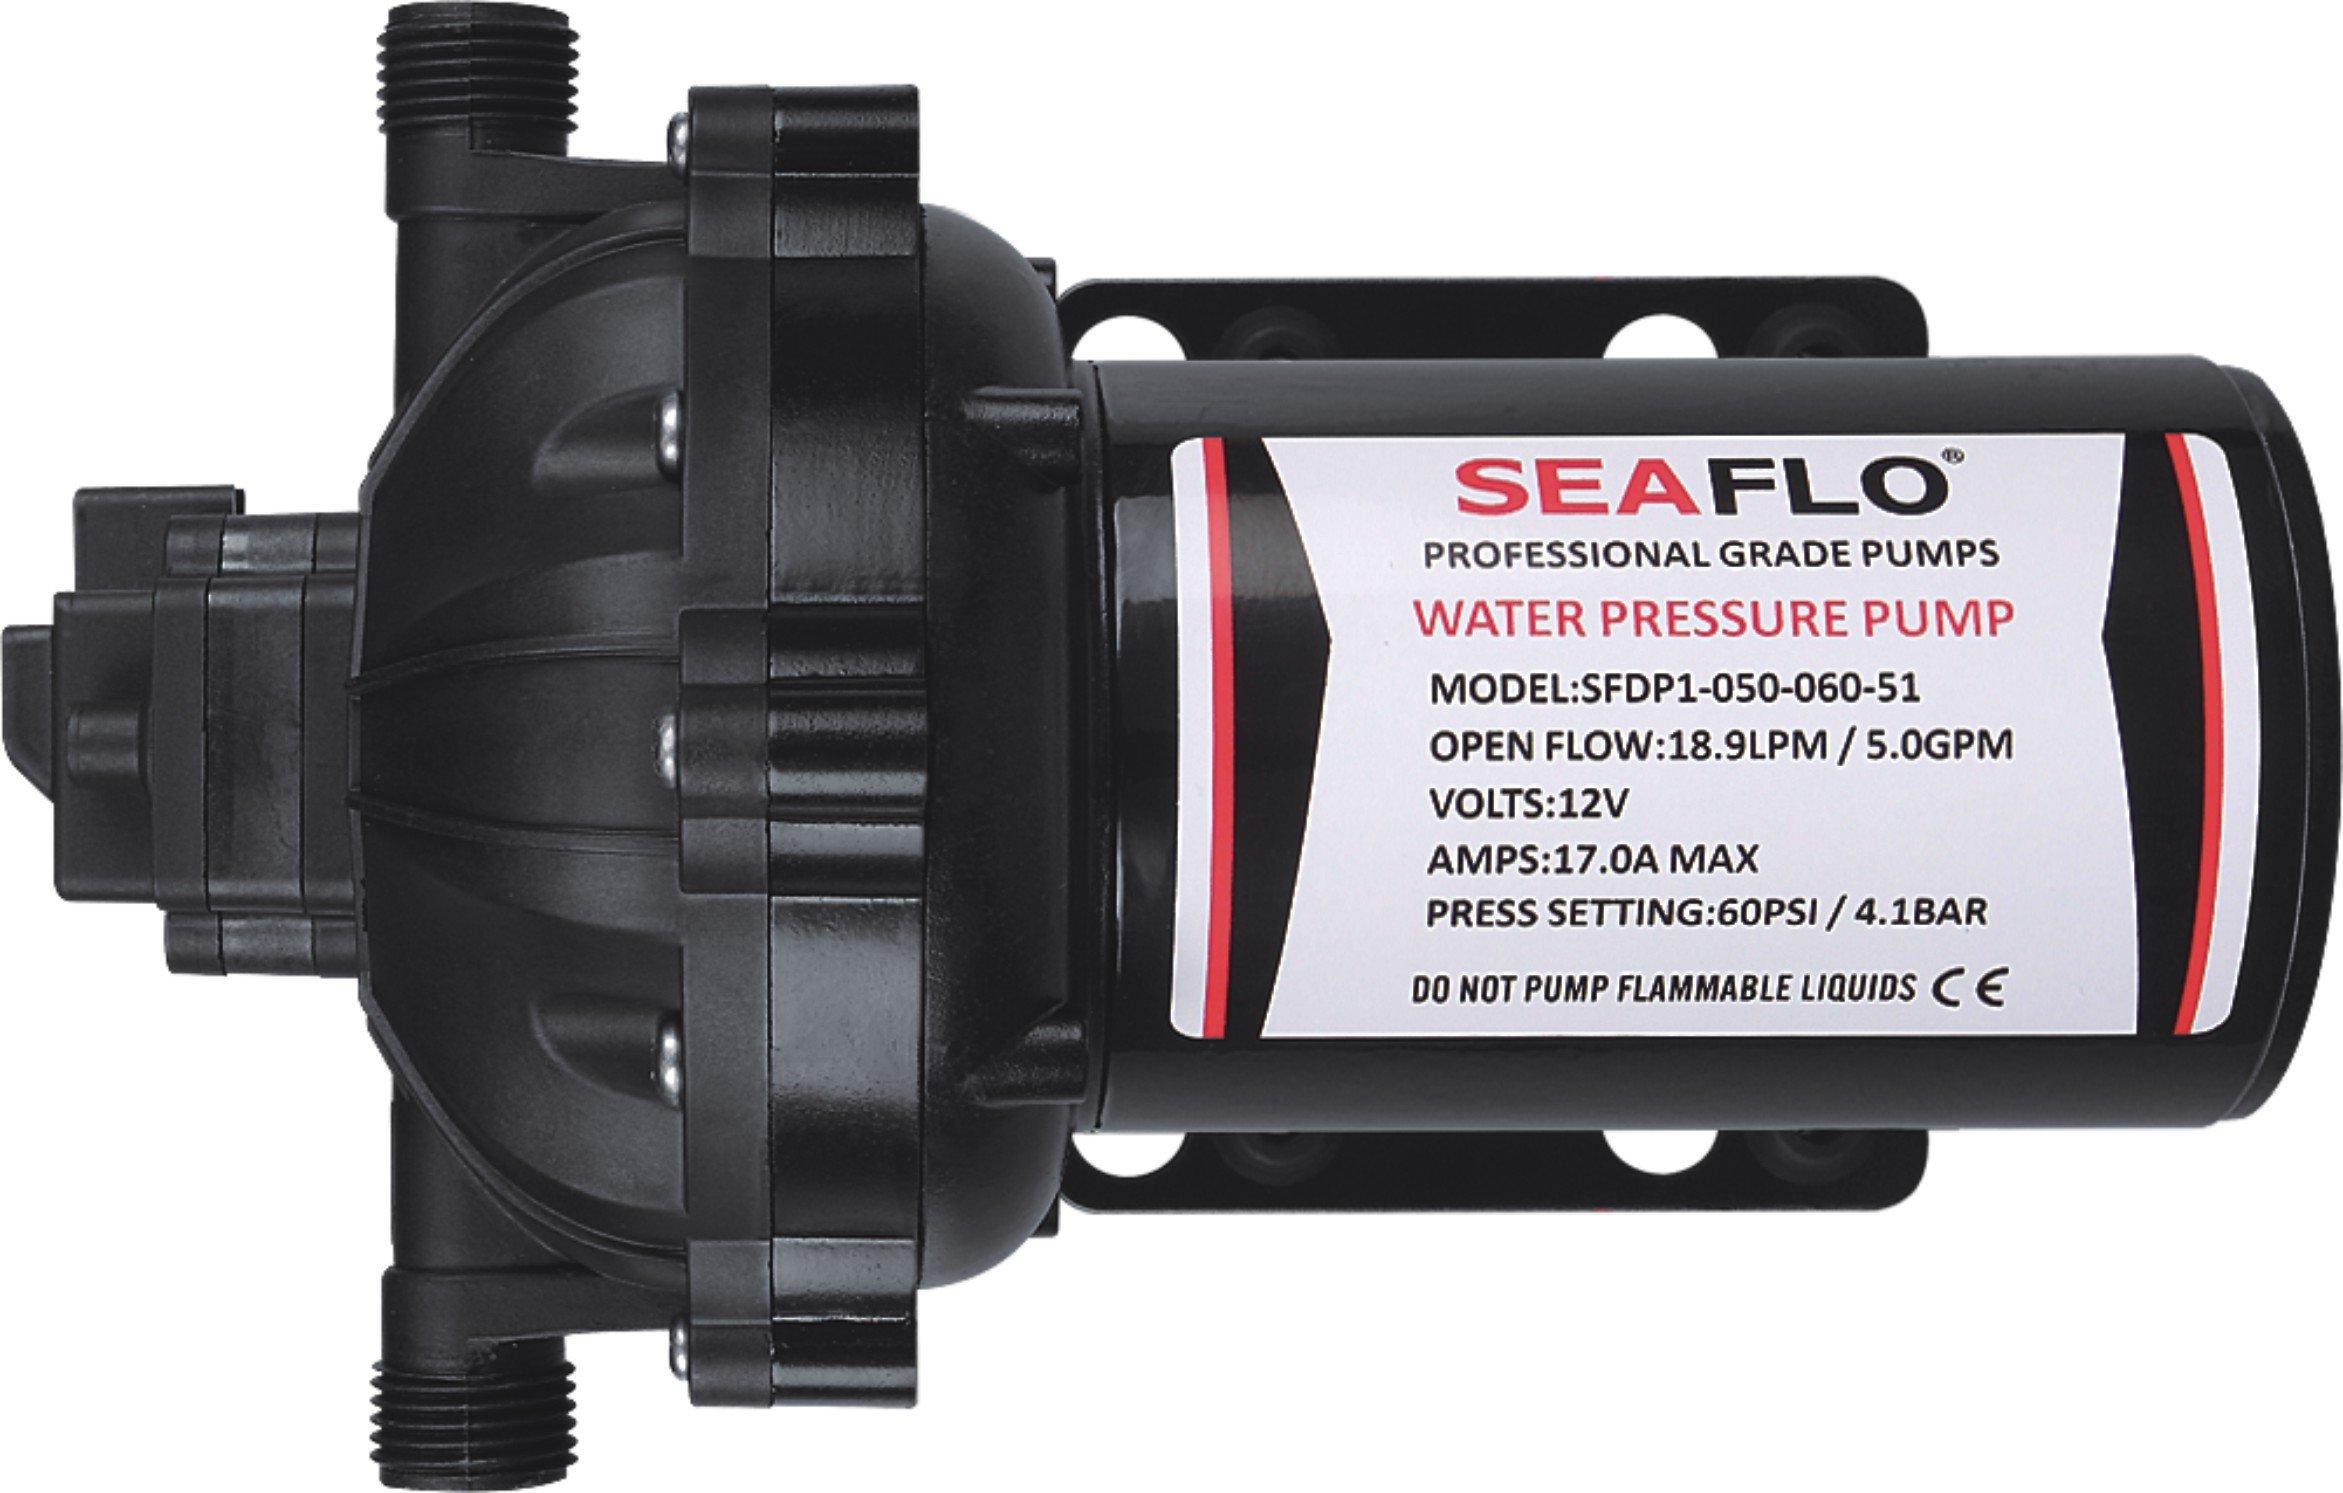 SEAFLO 12V 5.0GPM 60PSI 51-Series Water Pressure Diaphragm Pumps Self Priming Agricultural Sprayer